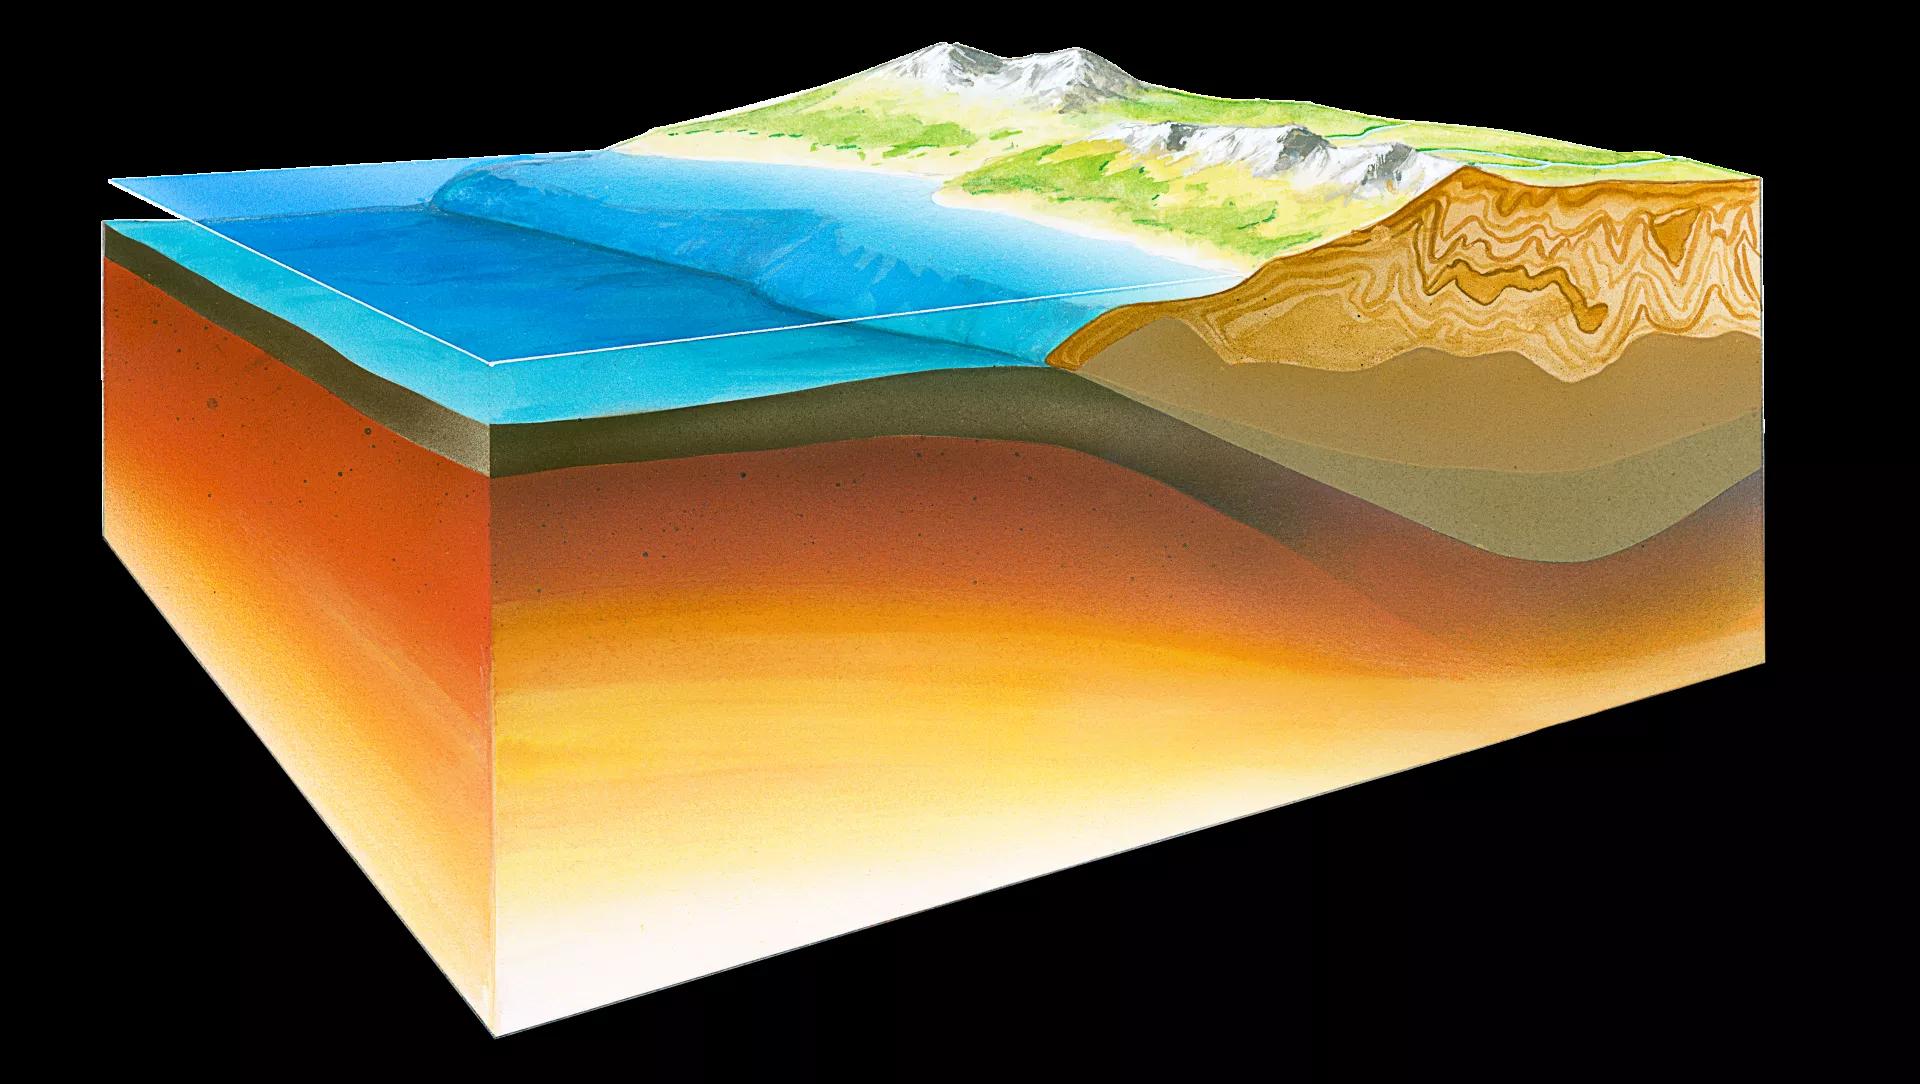 Earth S Crust